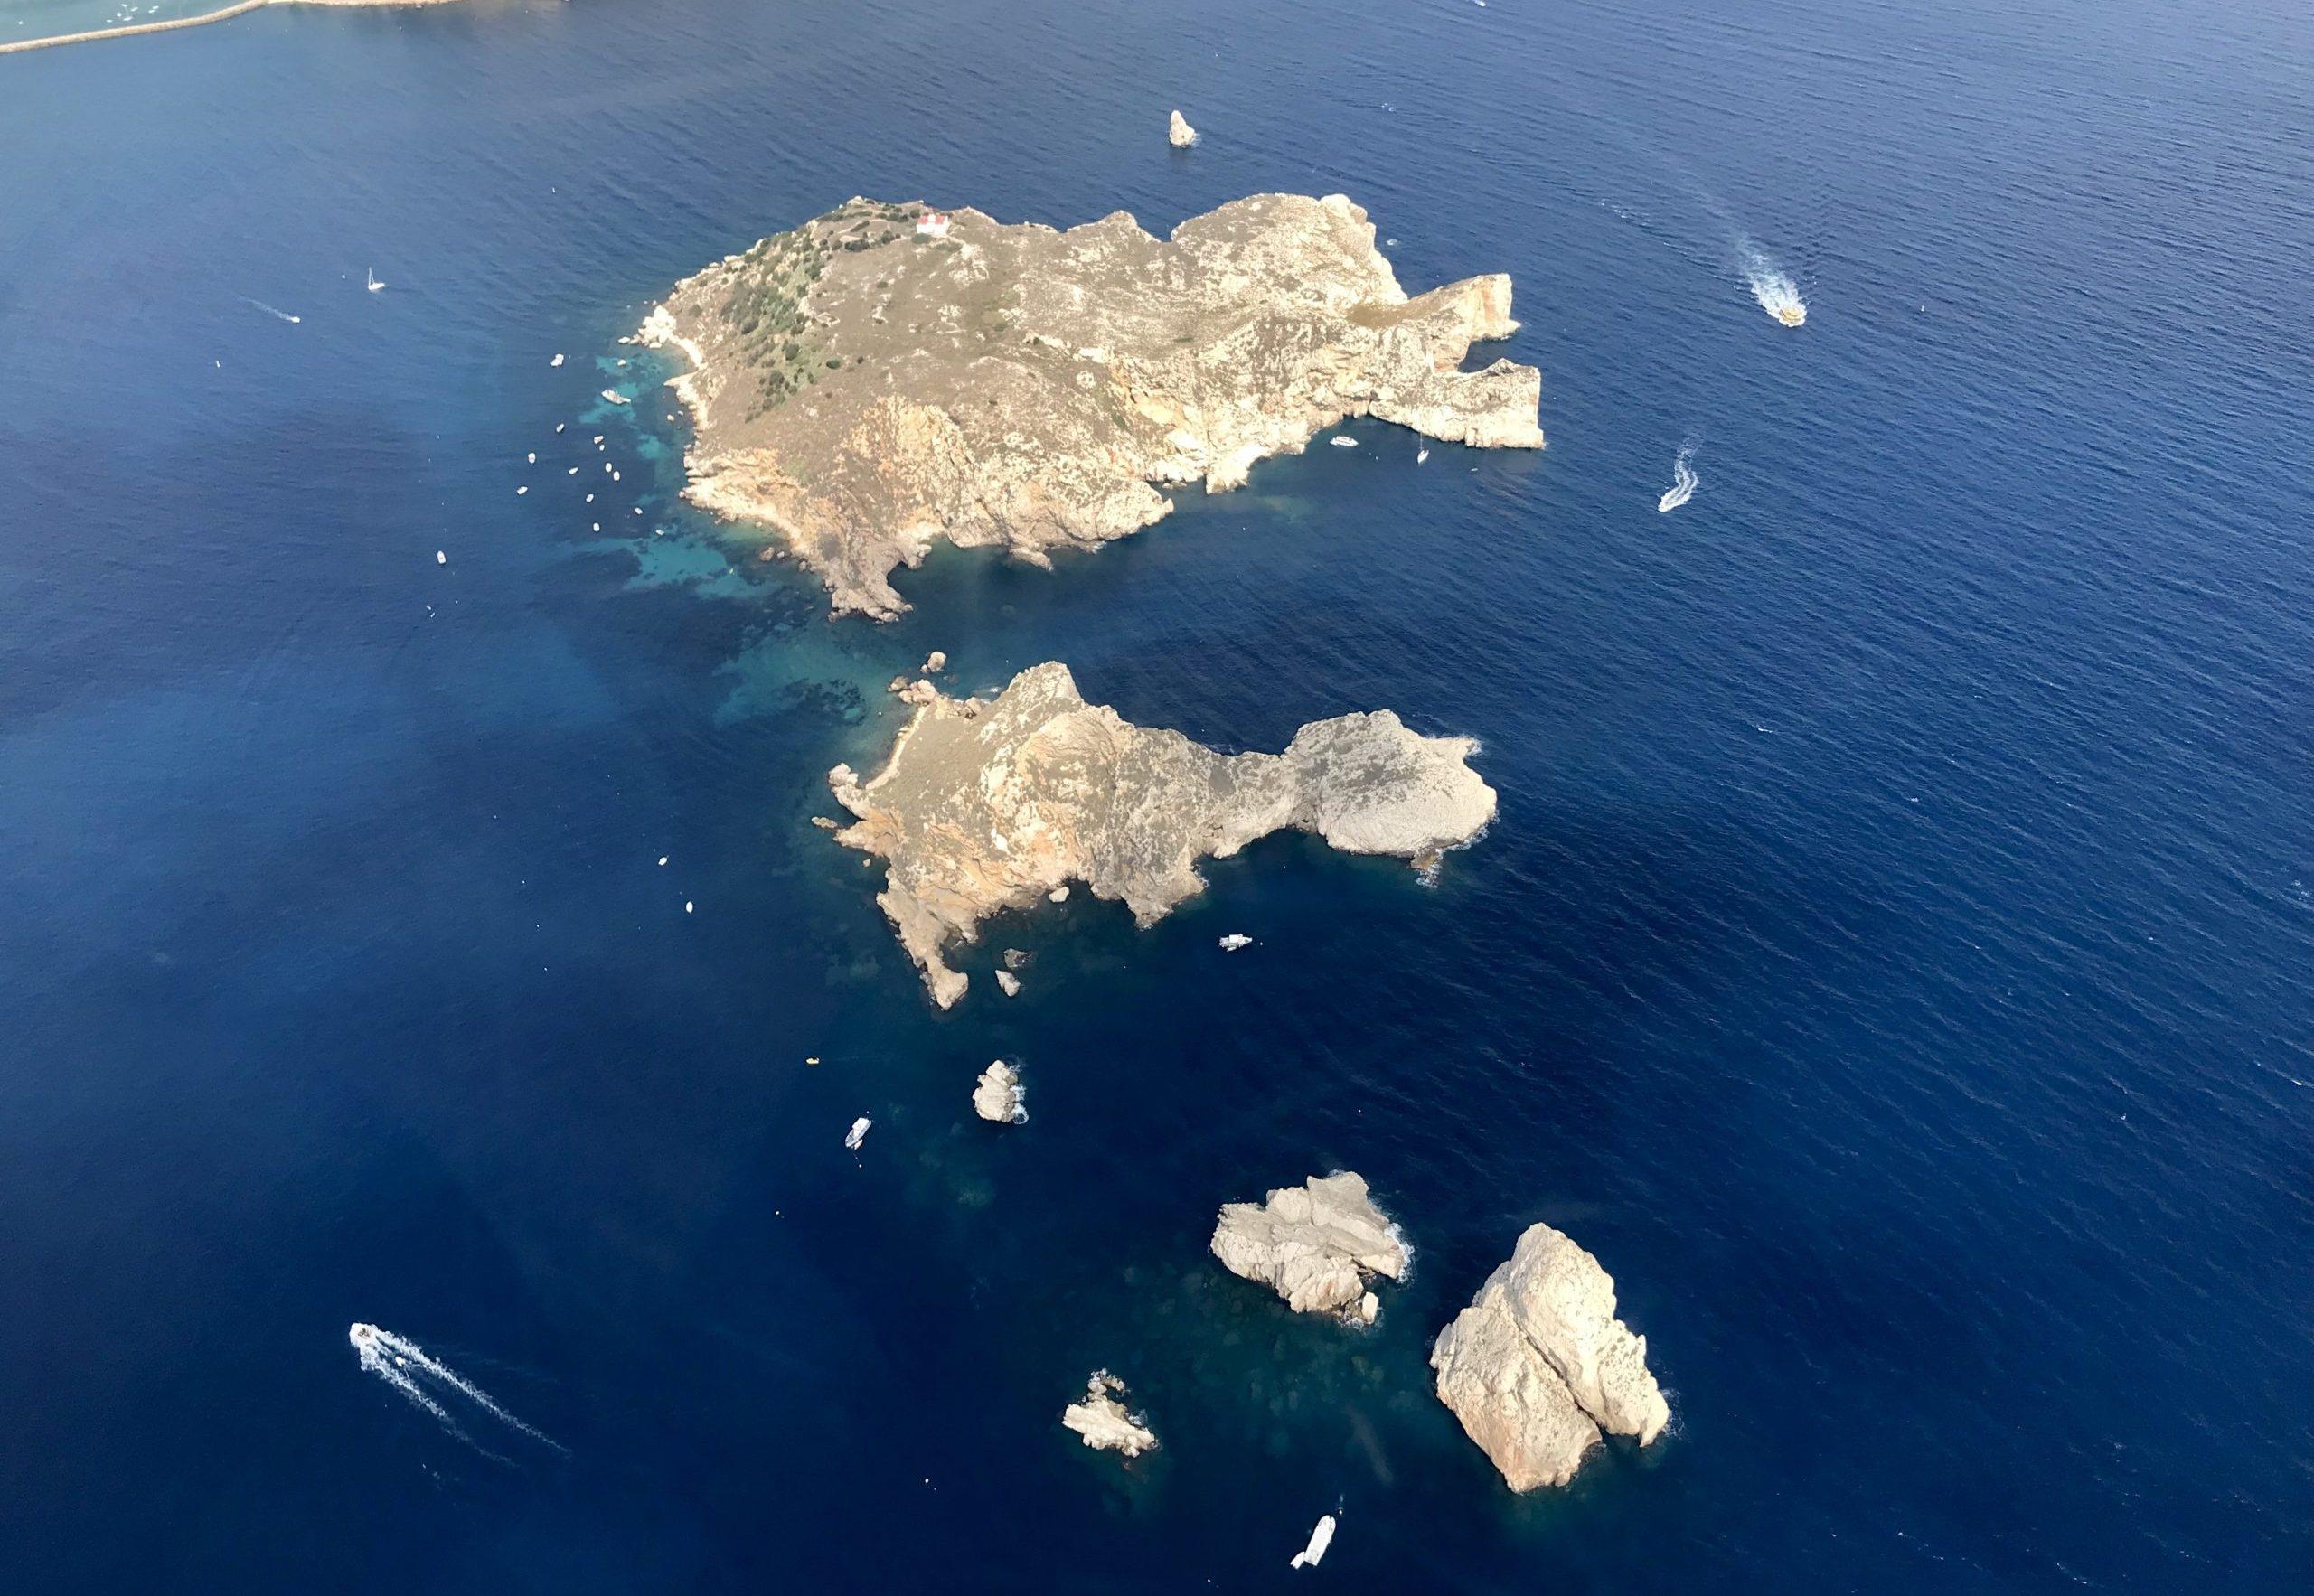 Les illes Medes scaled e1586875713563 - El Montgrí, Illes Medes i Baix Ter-Cataluña-España